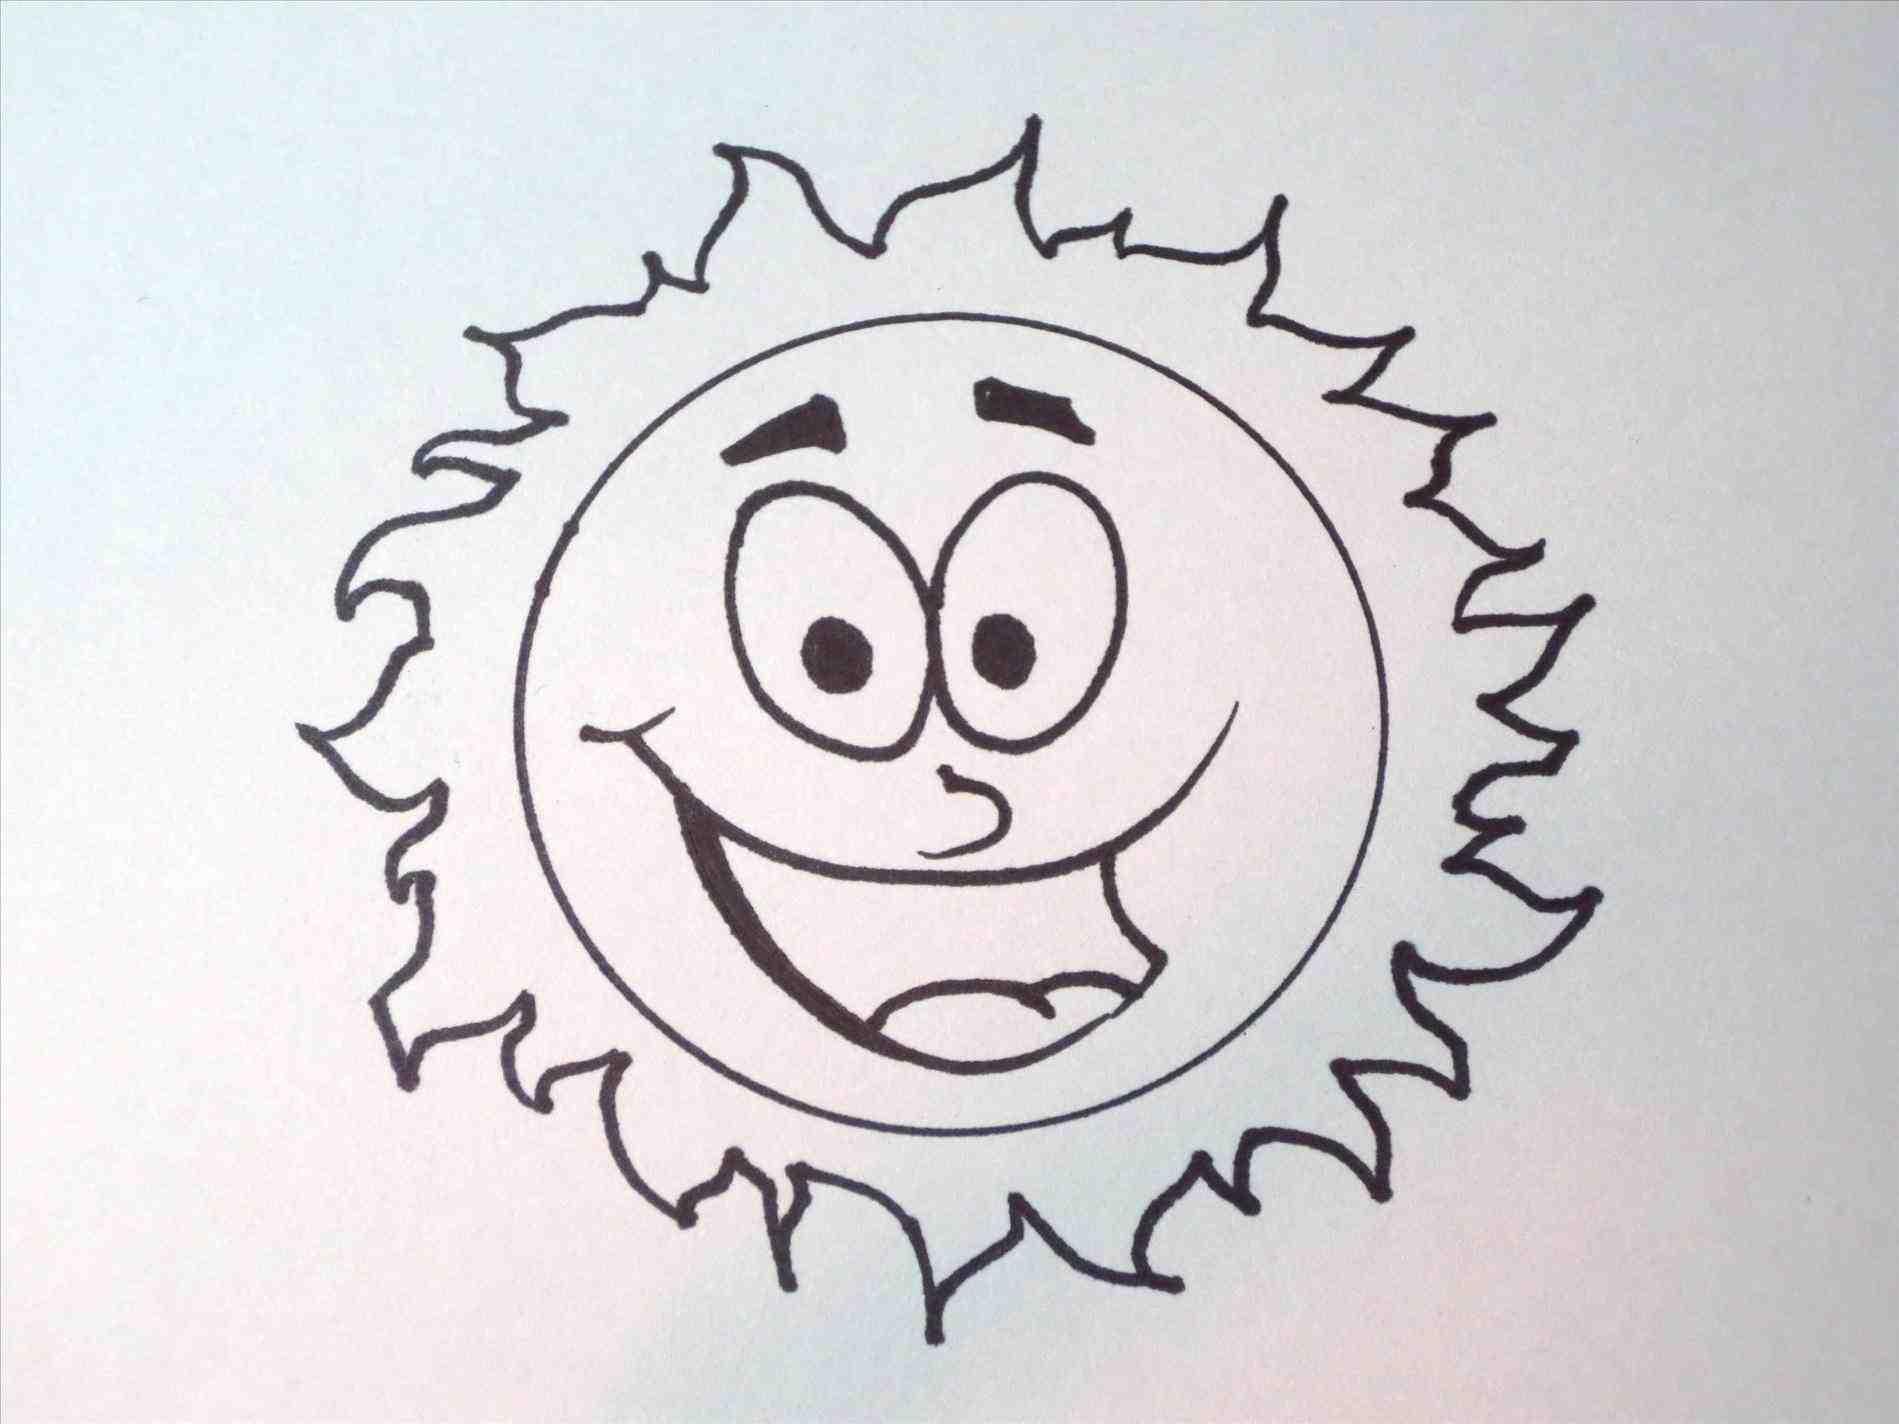 Aztec clipart face. Sun drawing at getdrawings